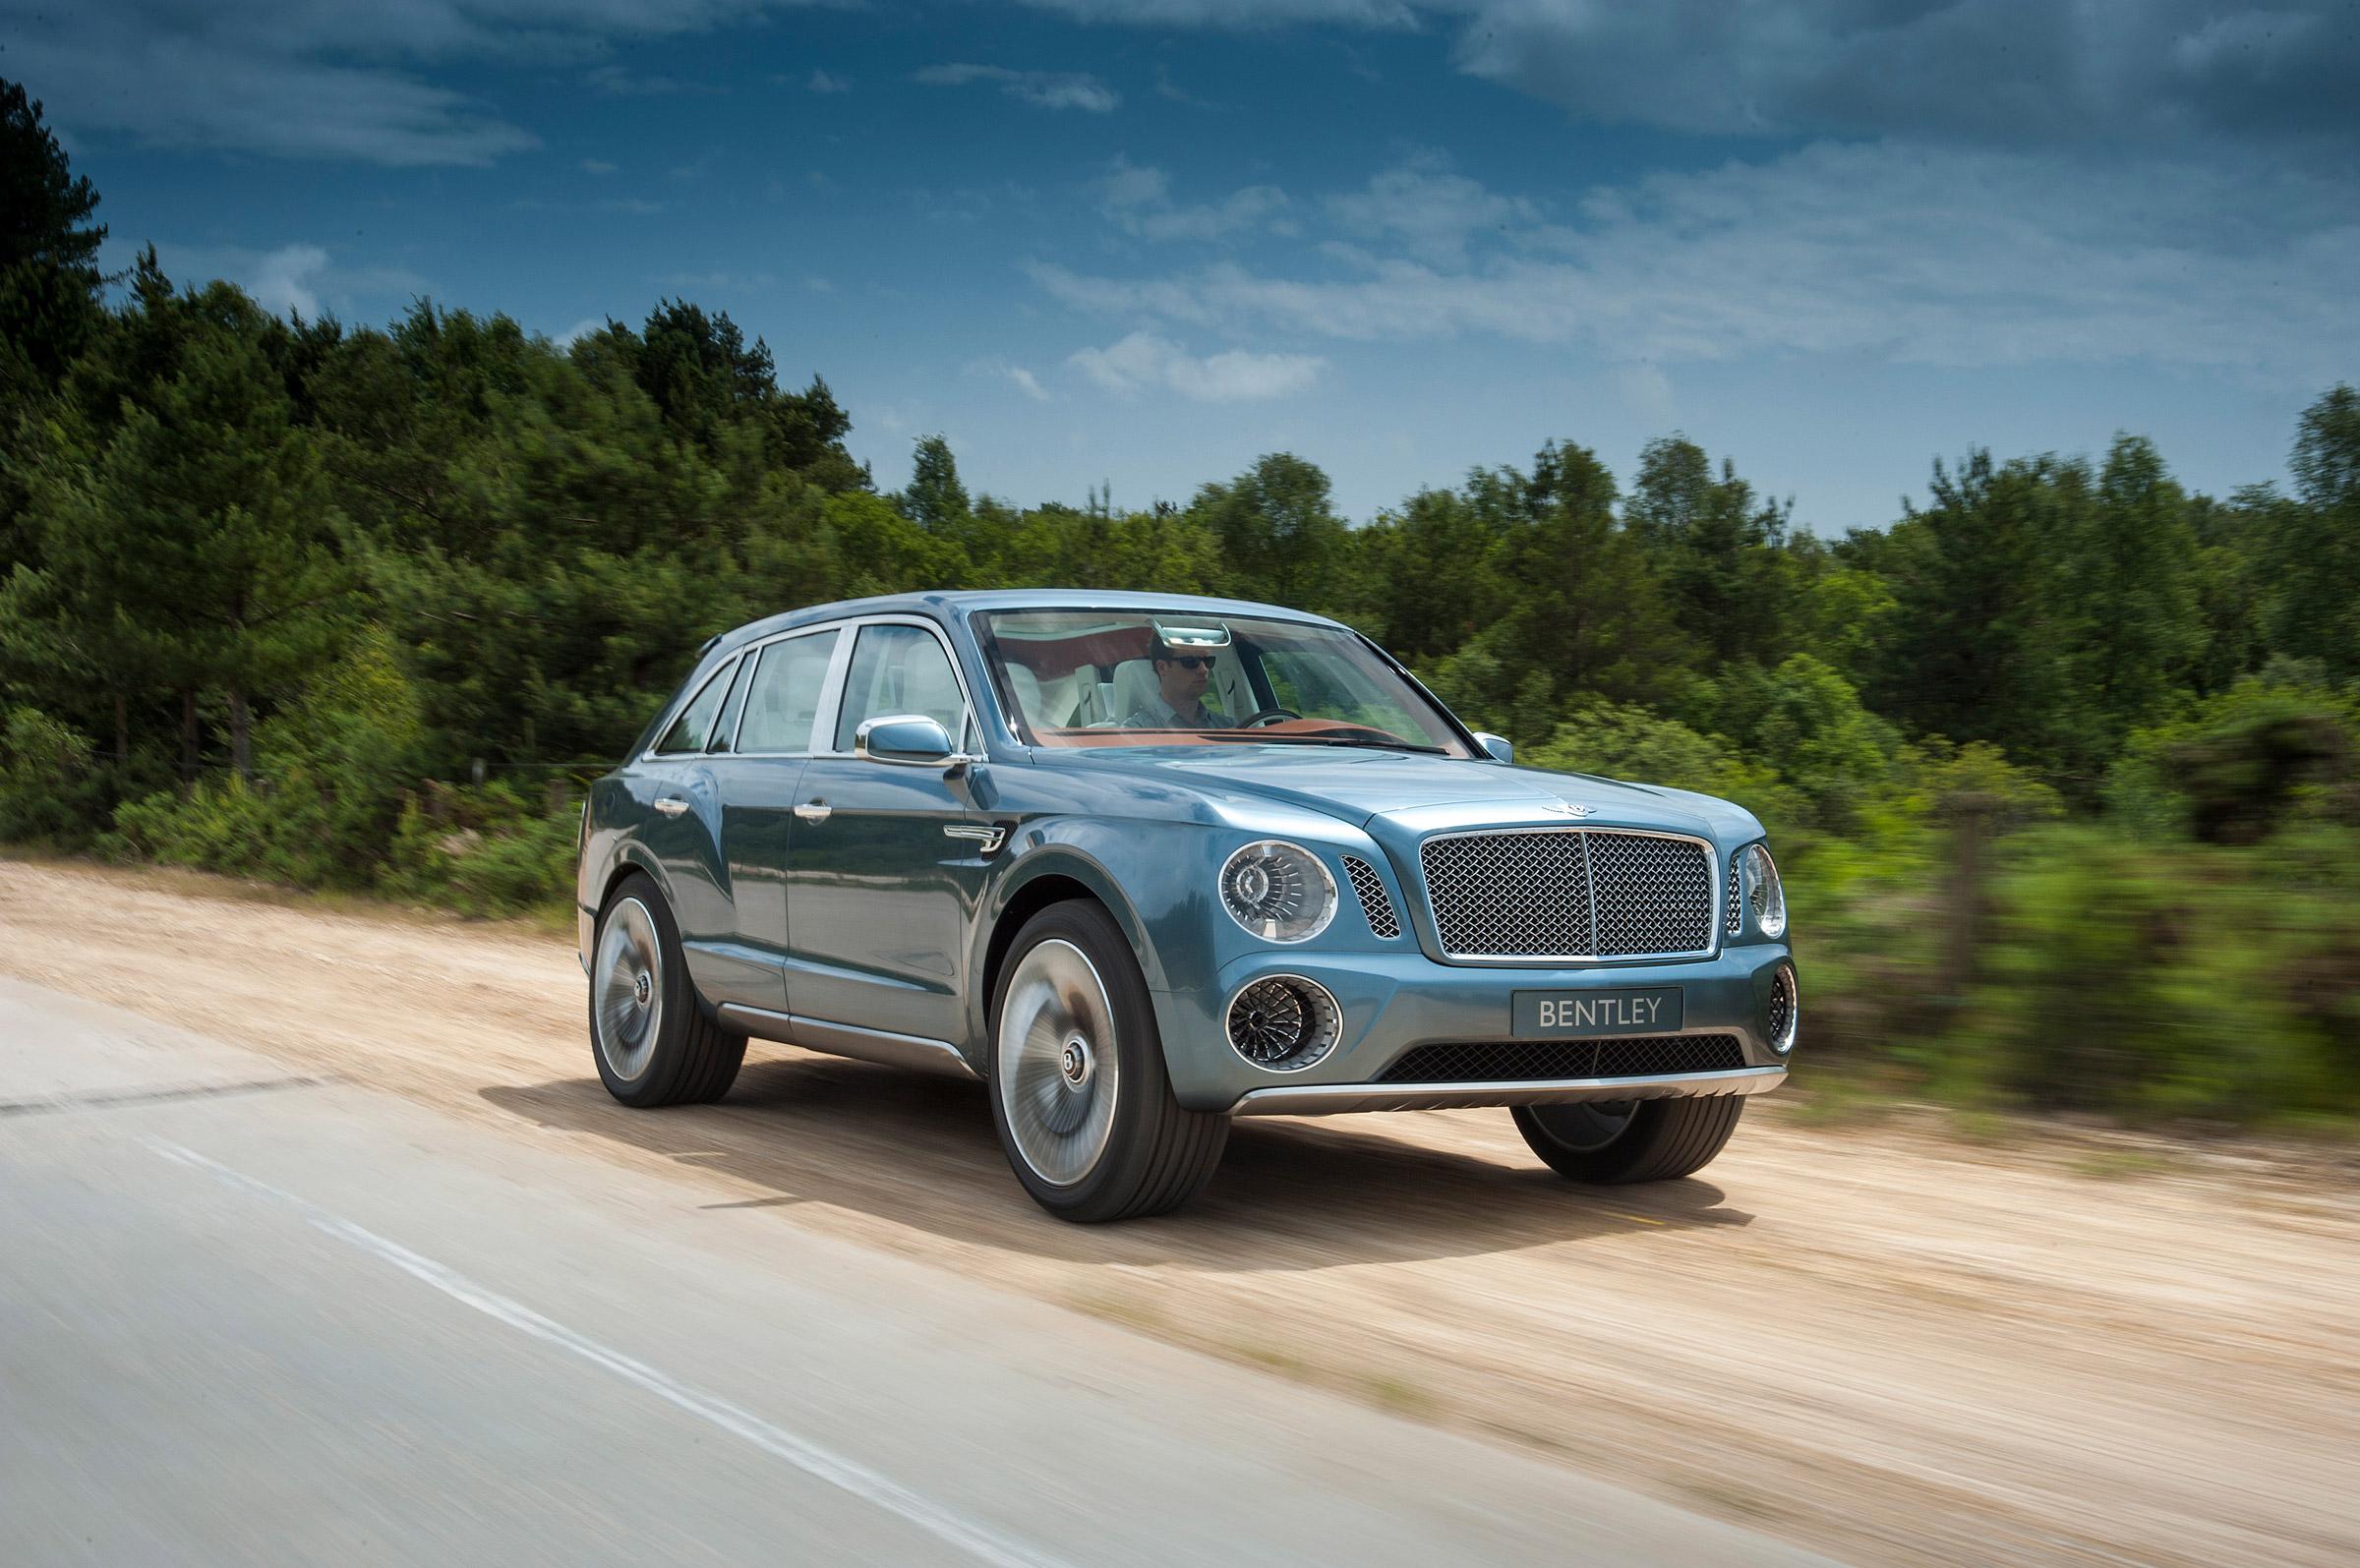 2014 Bentley SUV Speed Convertible free download image